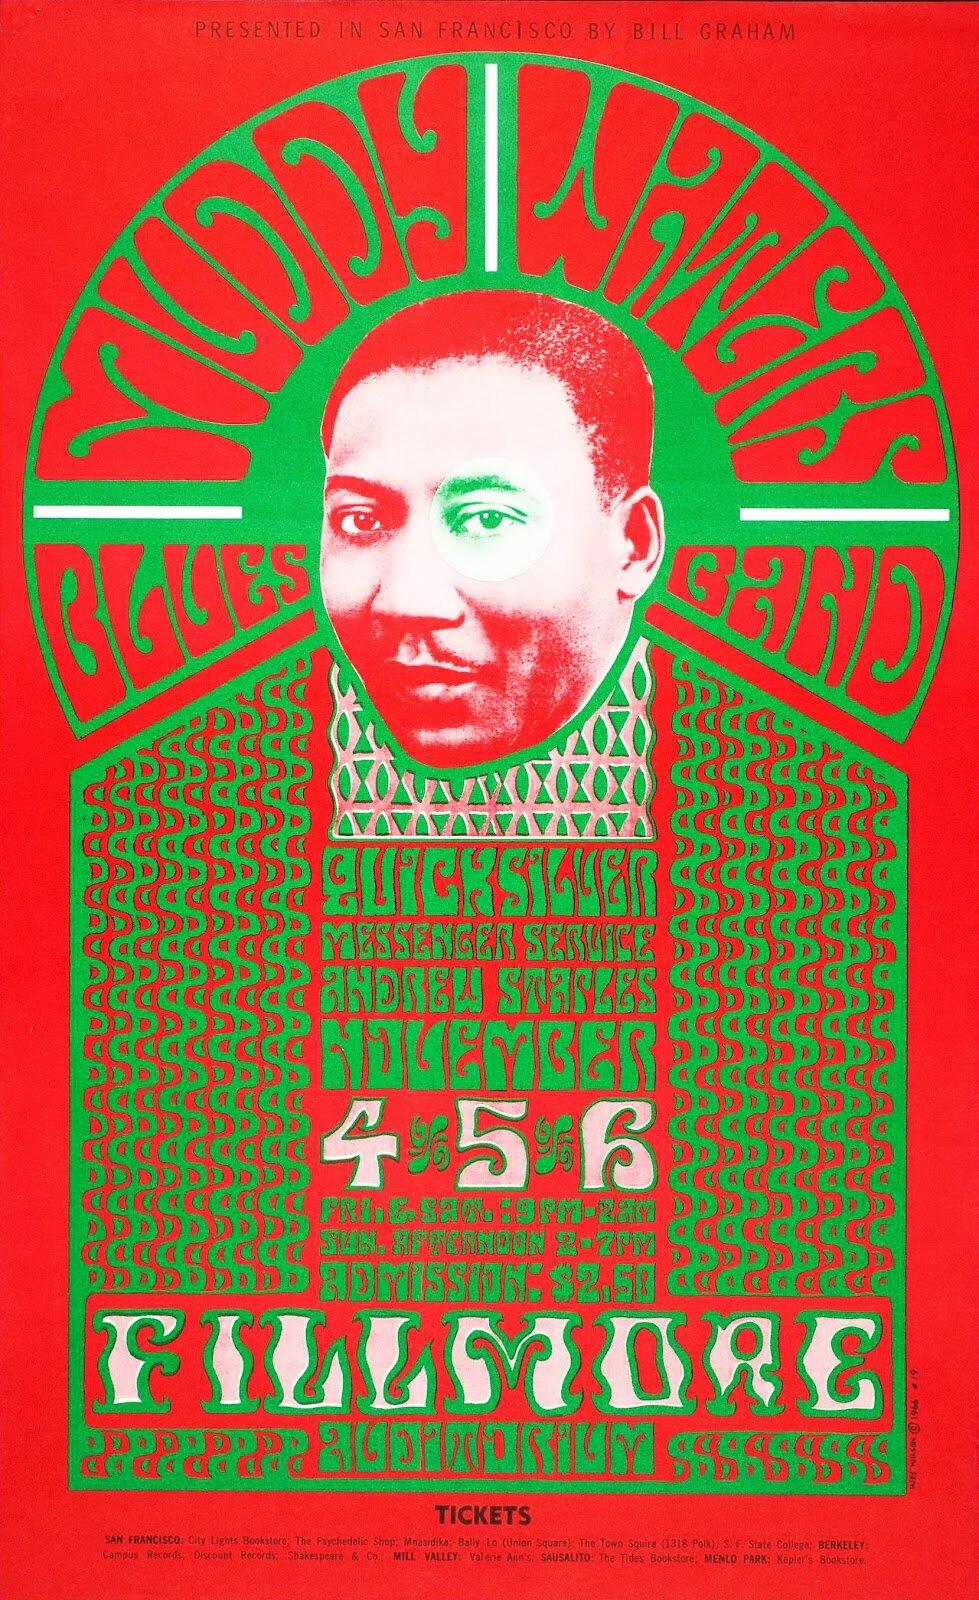 постер111.jpg